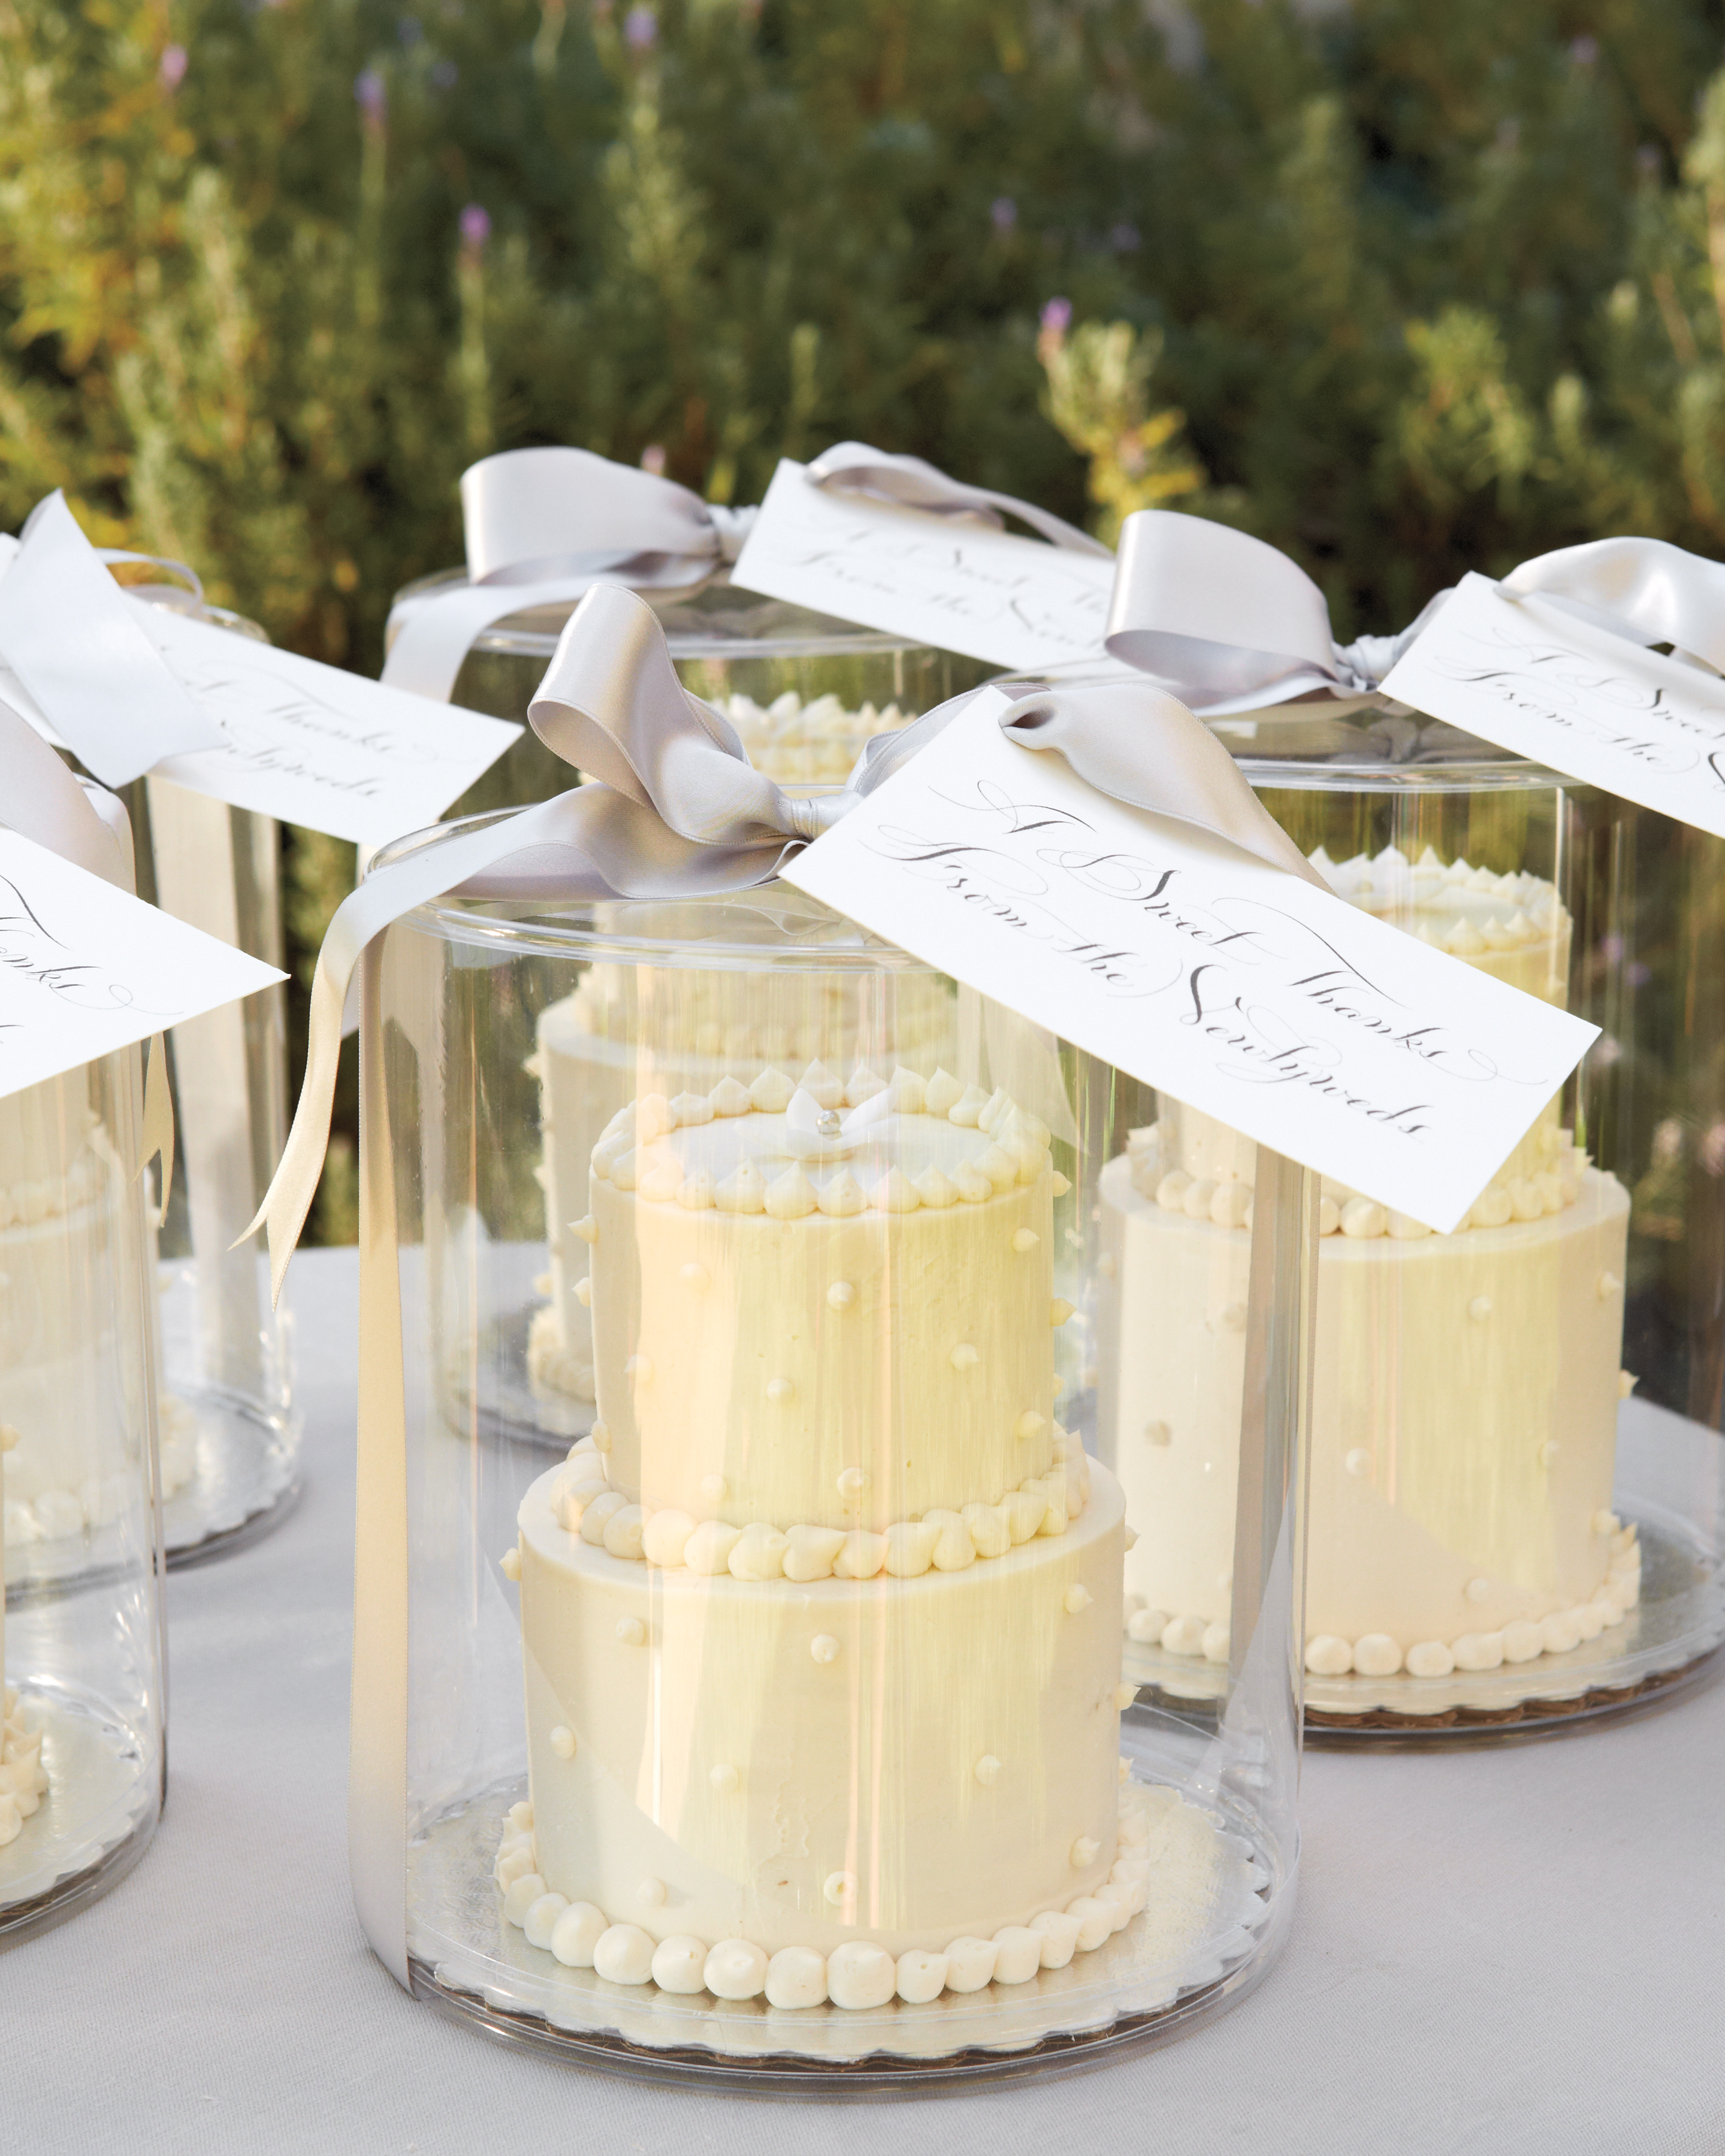 small-wedding-cakes-mwd109296.jpg